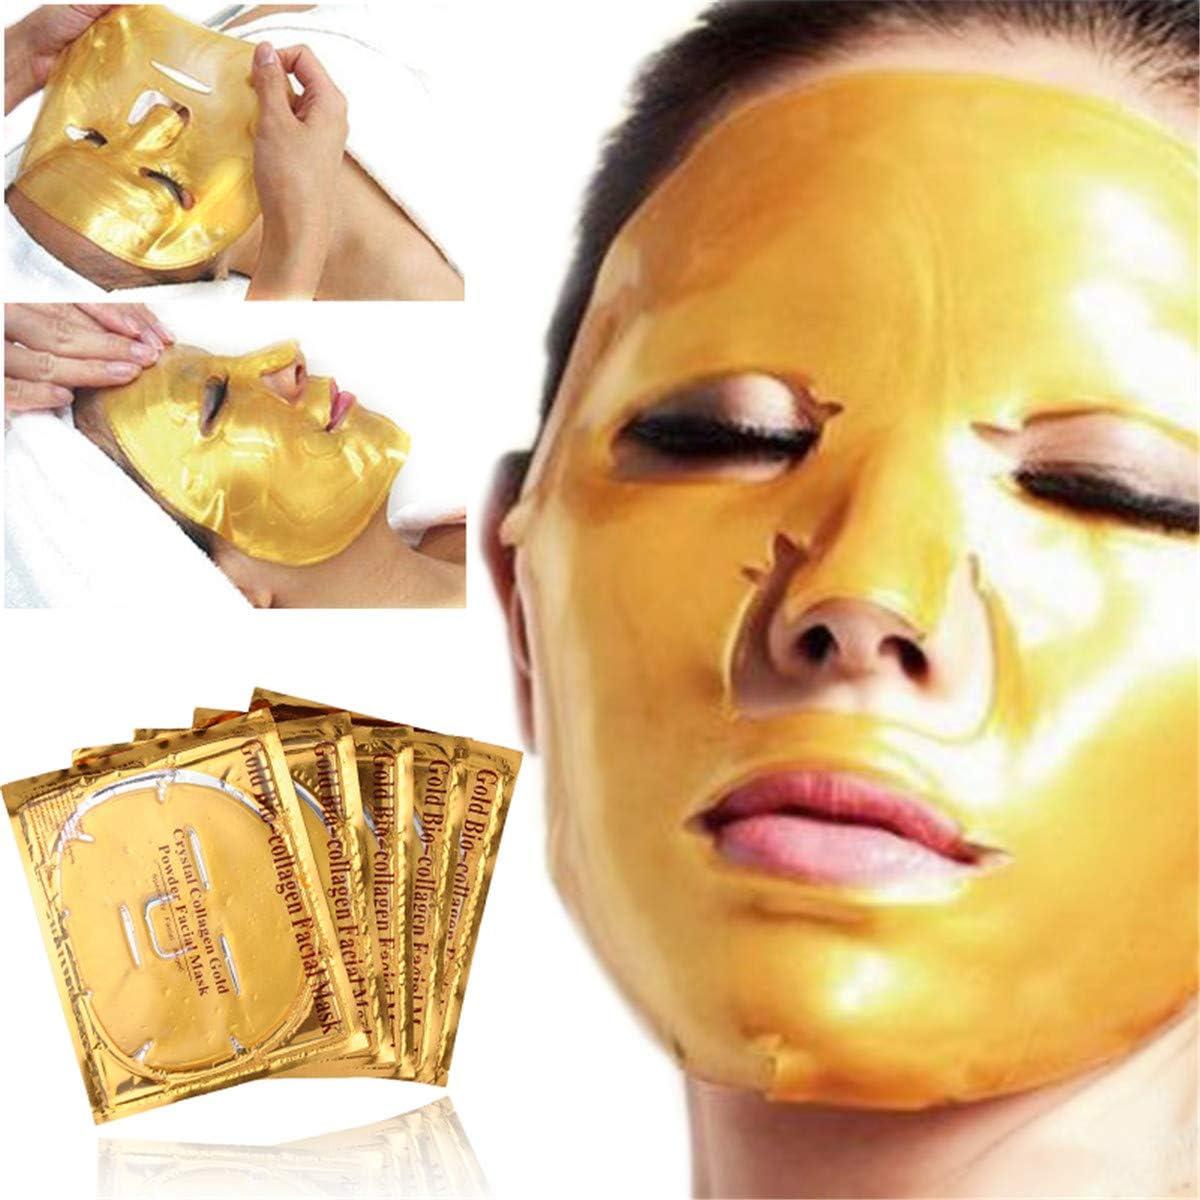 Mascarilla Facial Hidratante Antienvejecimiento Mascarilla Facial Hidratante De Oro: Amazon.es: Belleza